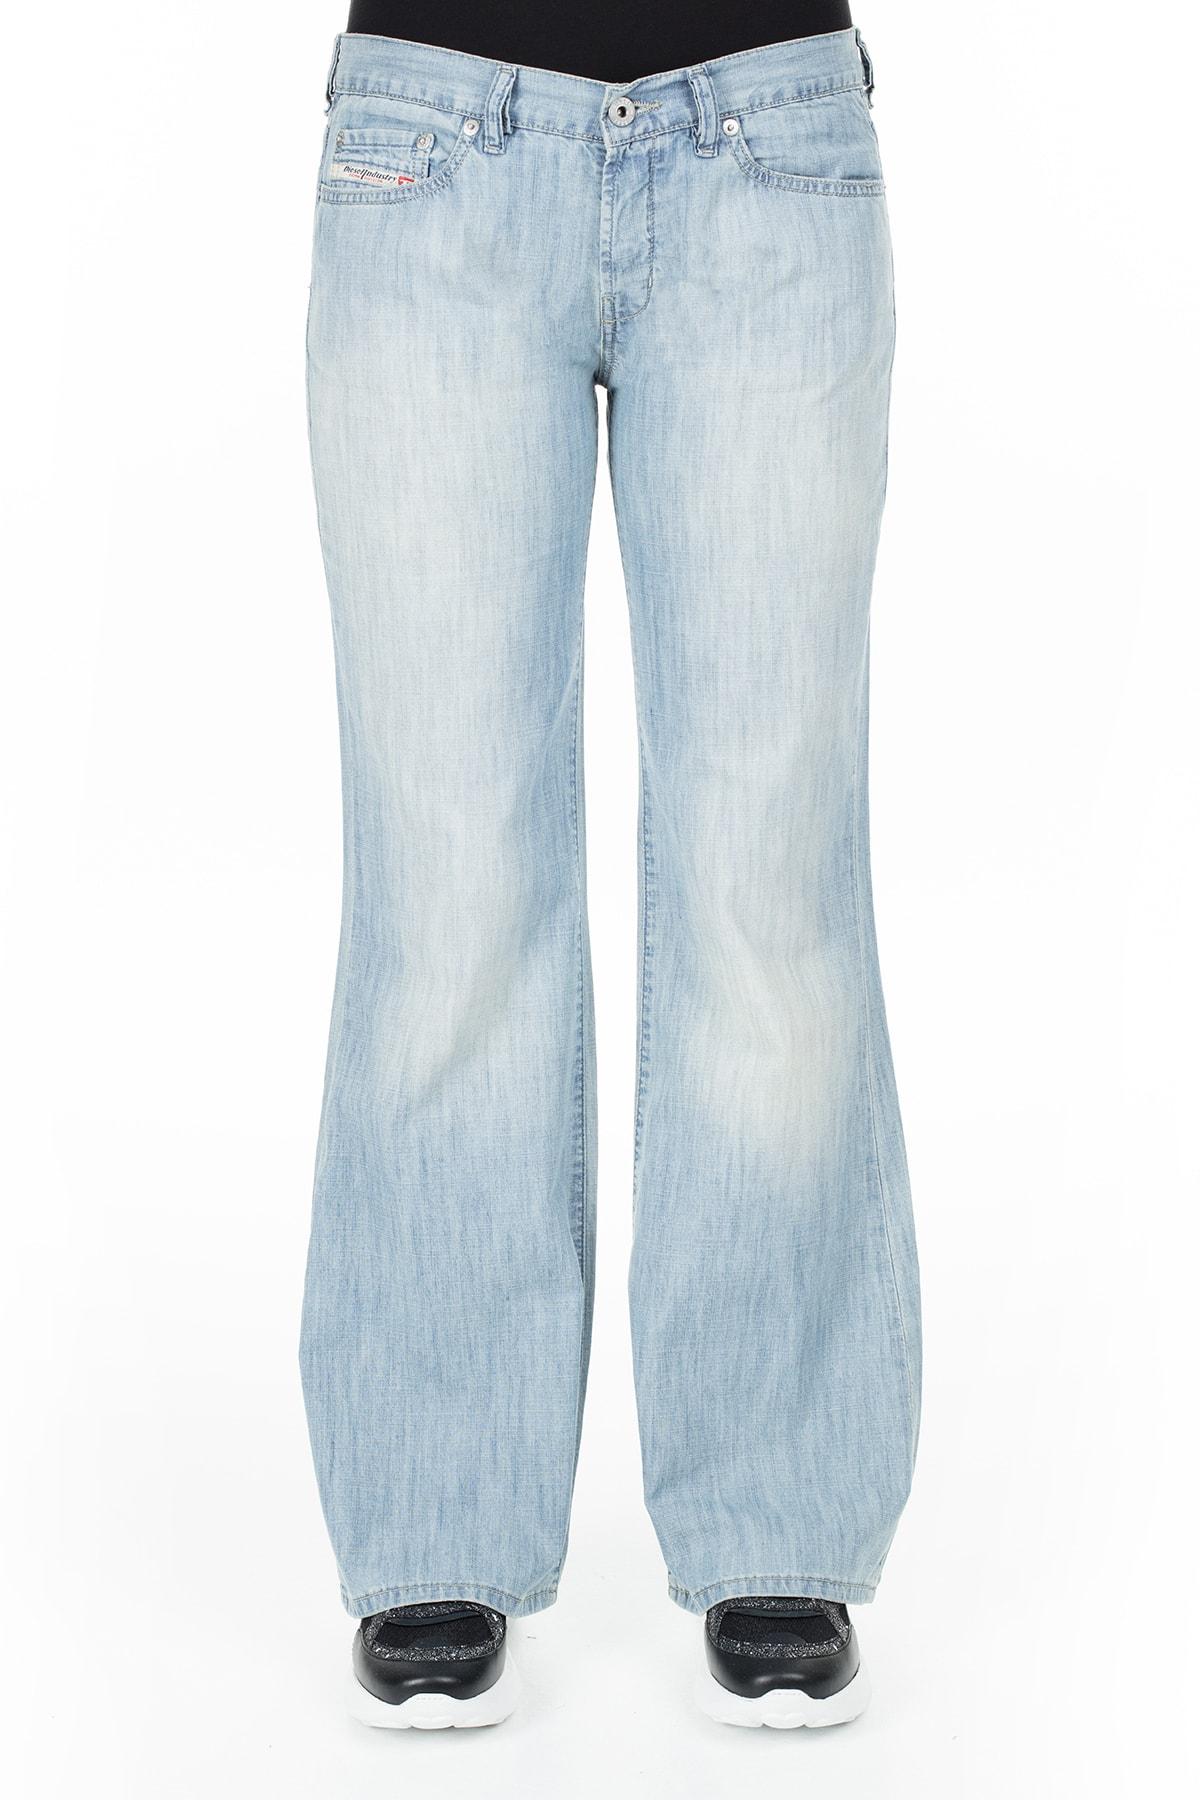 Diesel Jeans Kadın Kot Pantolon Zoxdazel